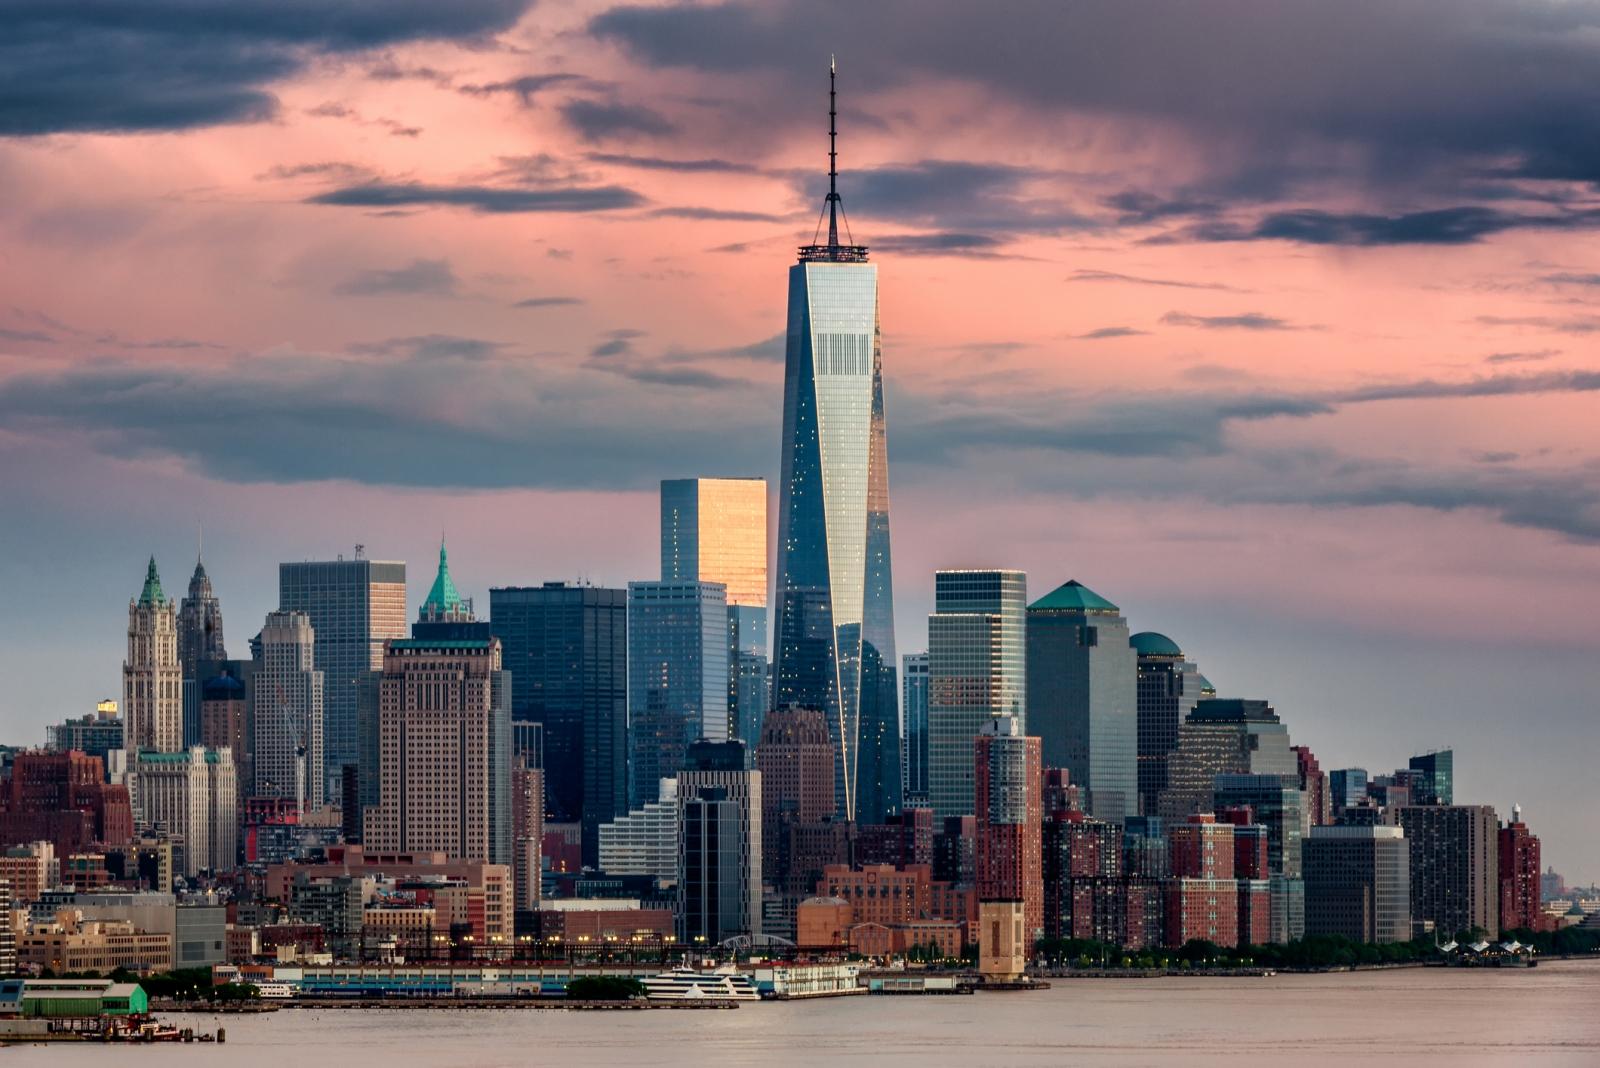 Tallest Buildings In Nyc The 15 Loftiest Skyscrapers In New York Streeteasy